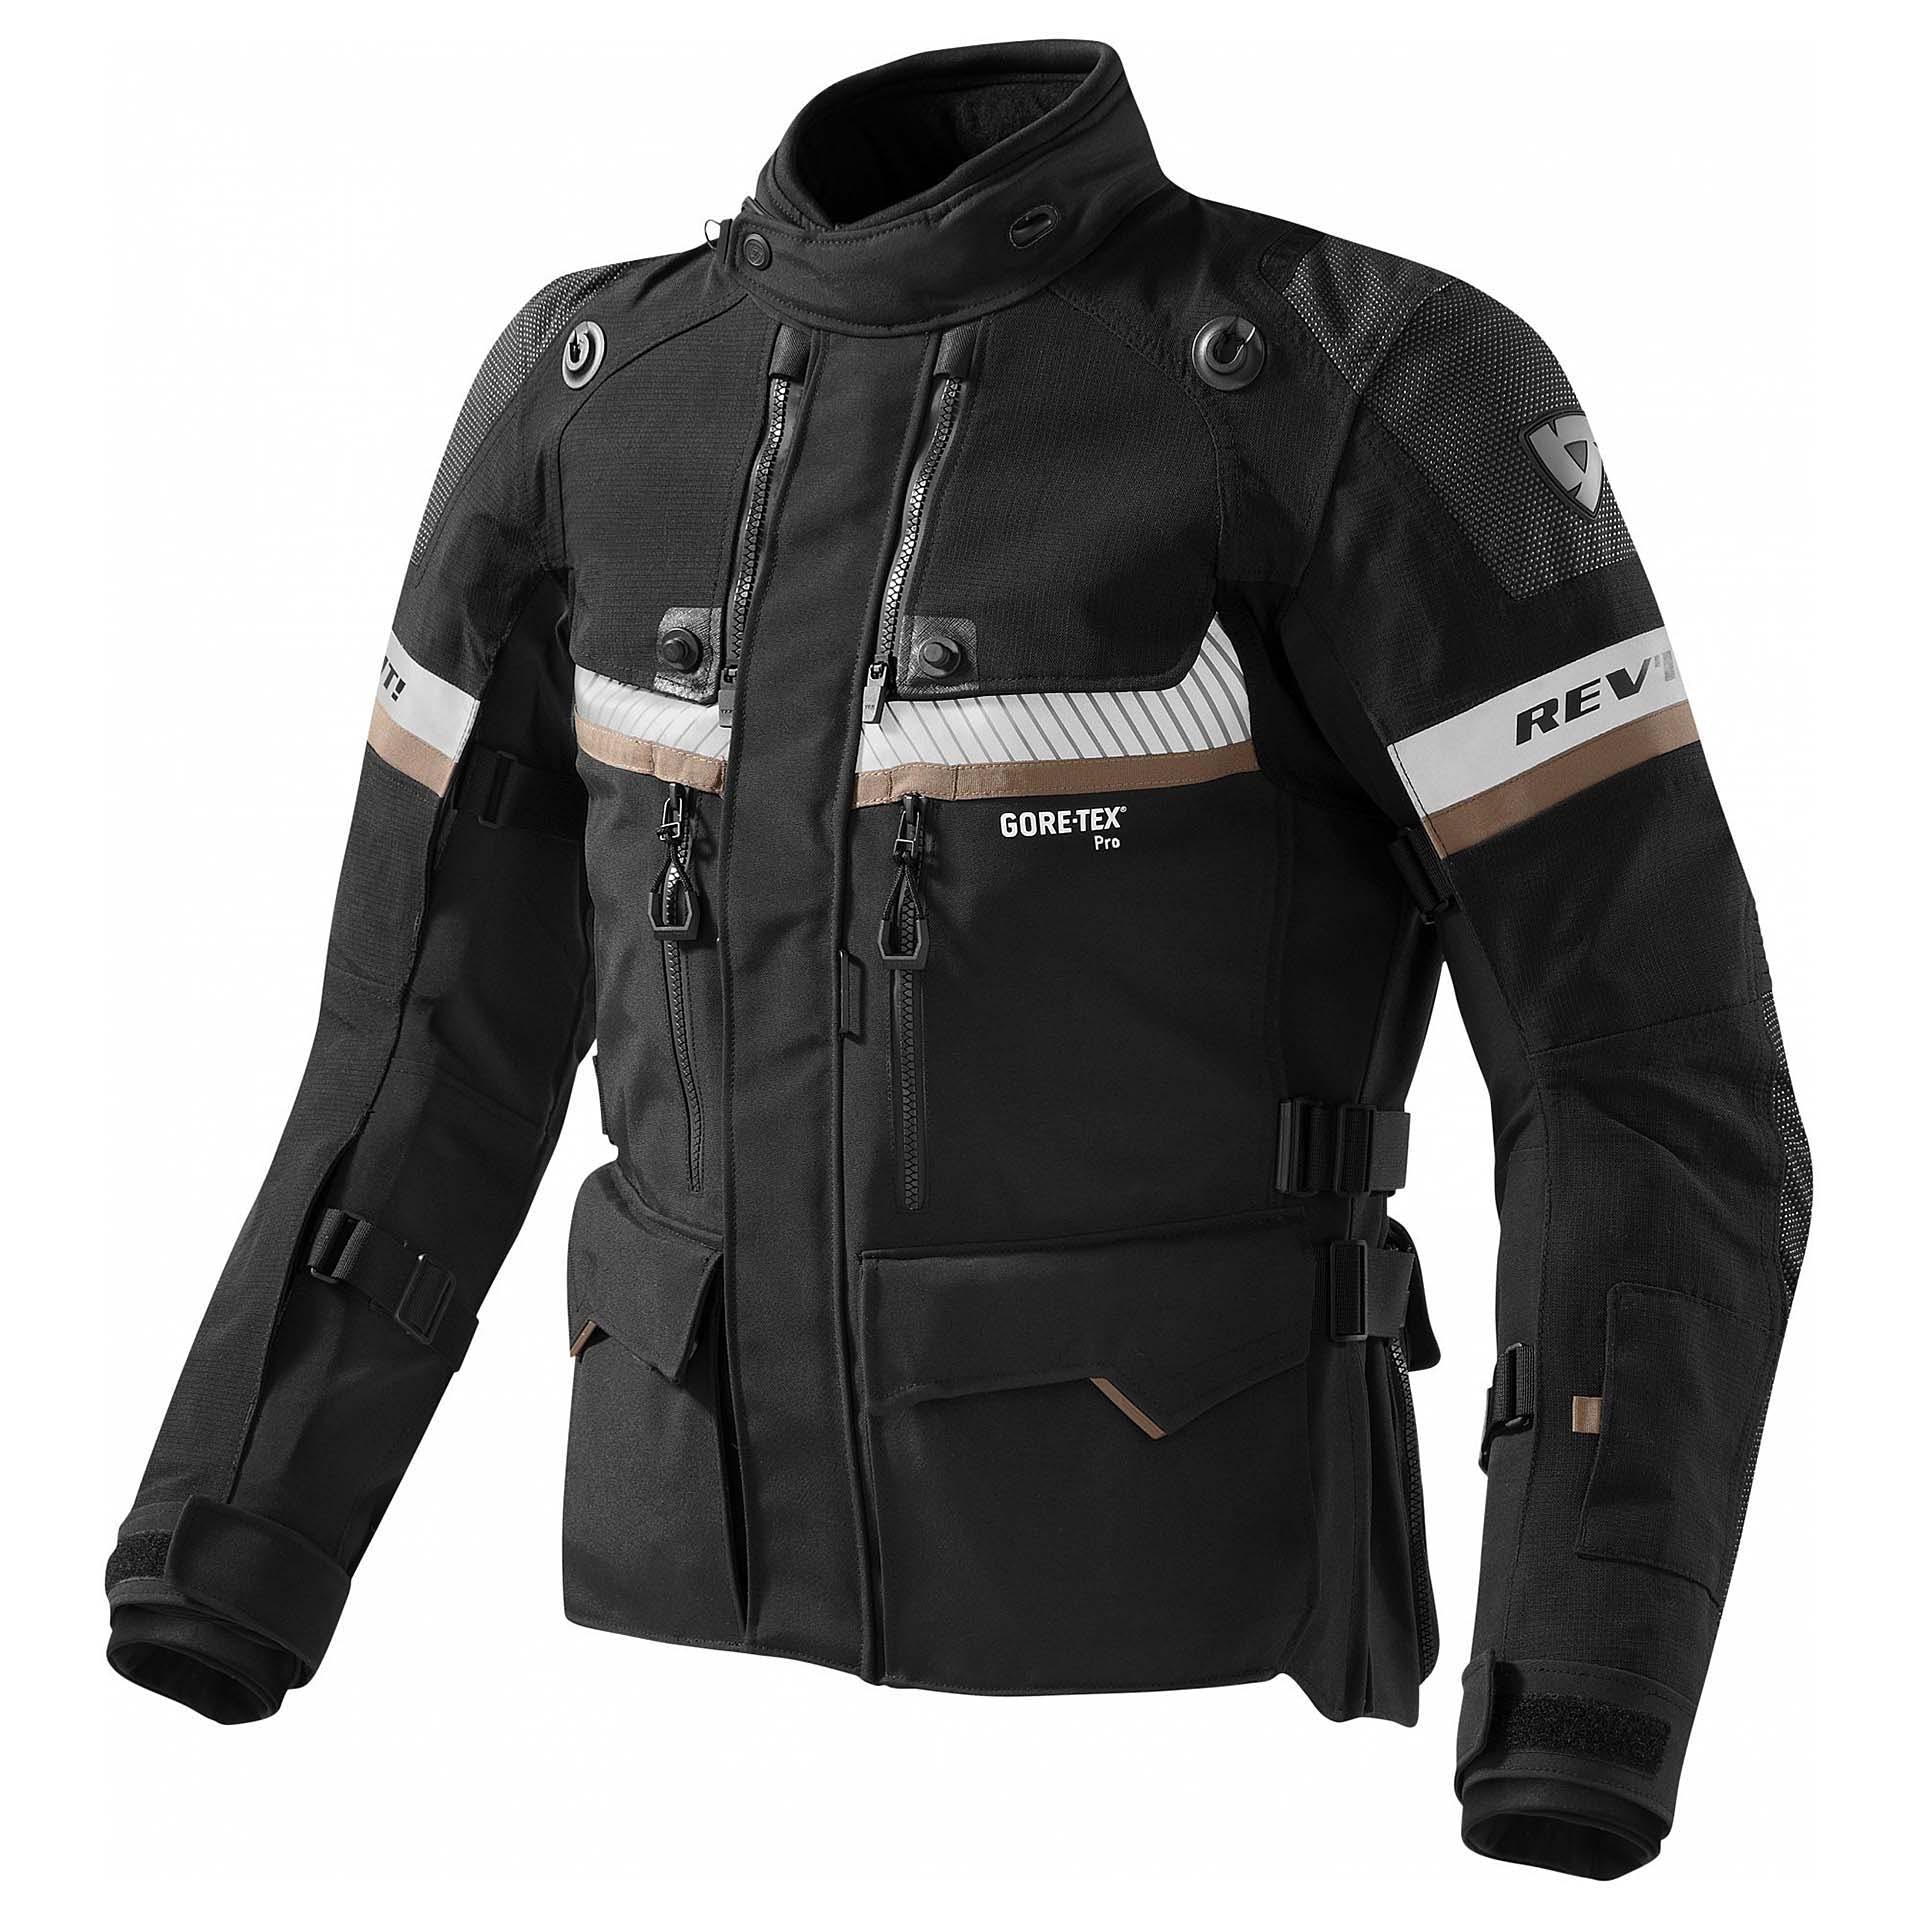 Rev'it! Dominator GTX giacca front